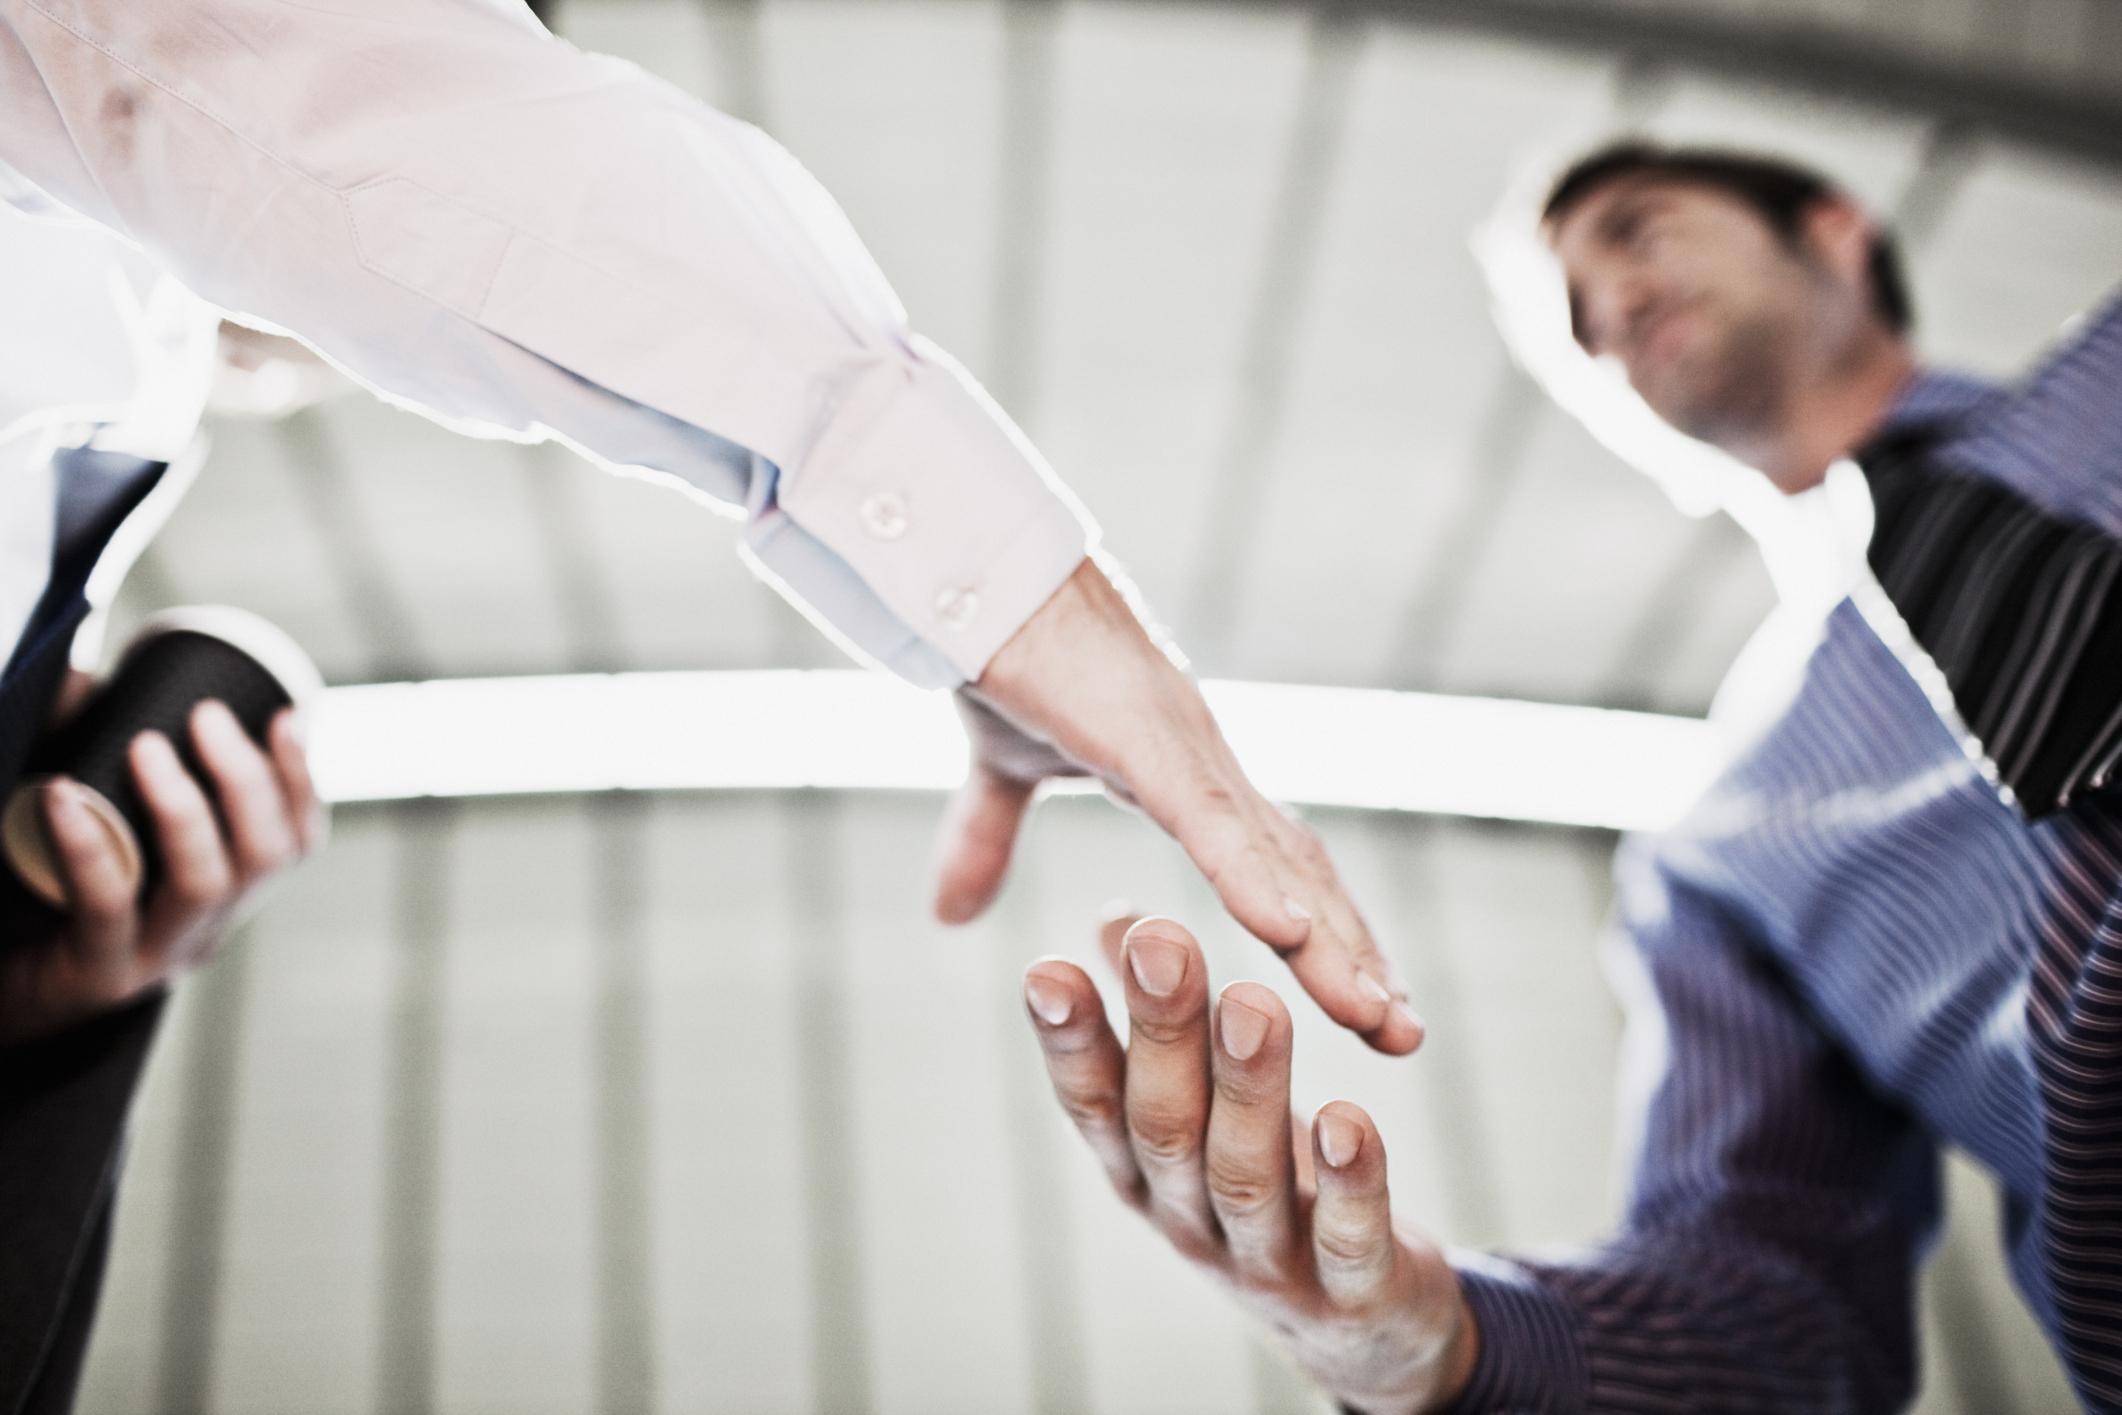 Two businessmen shake hands.